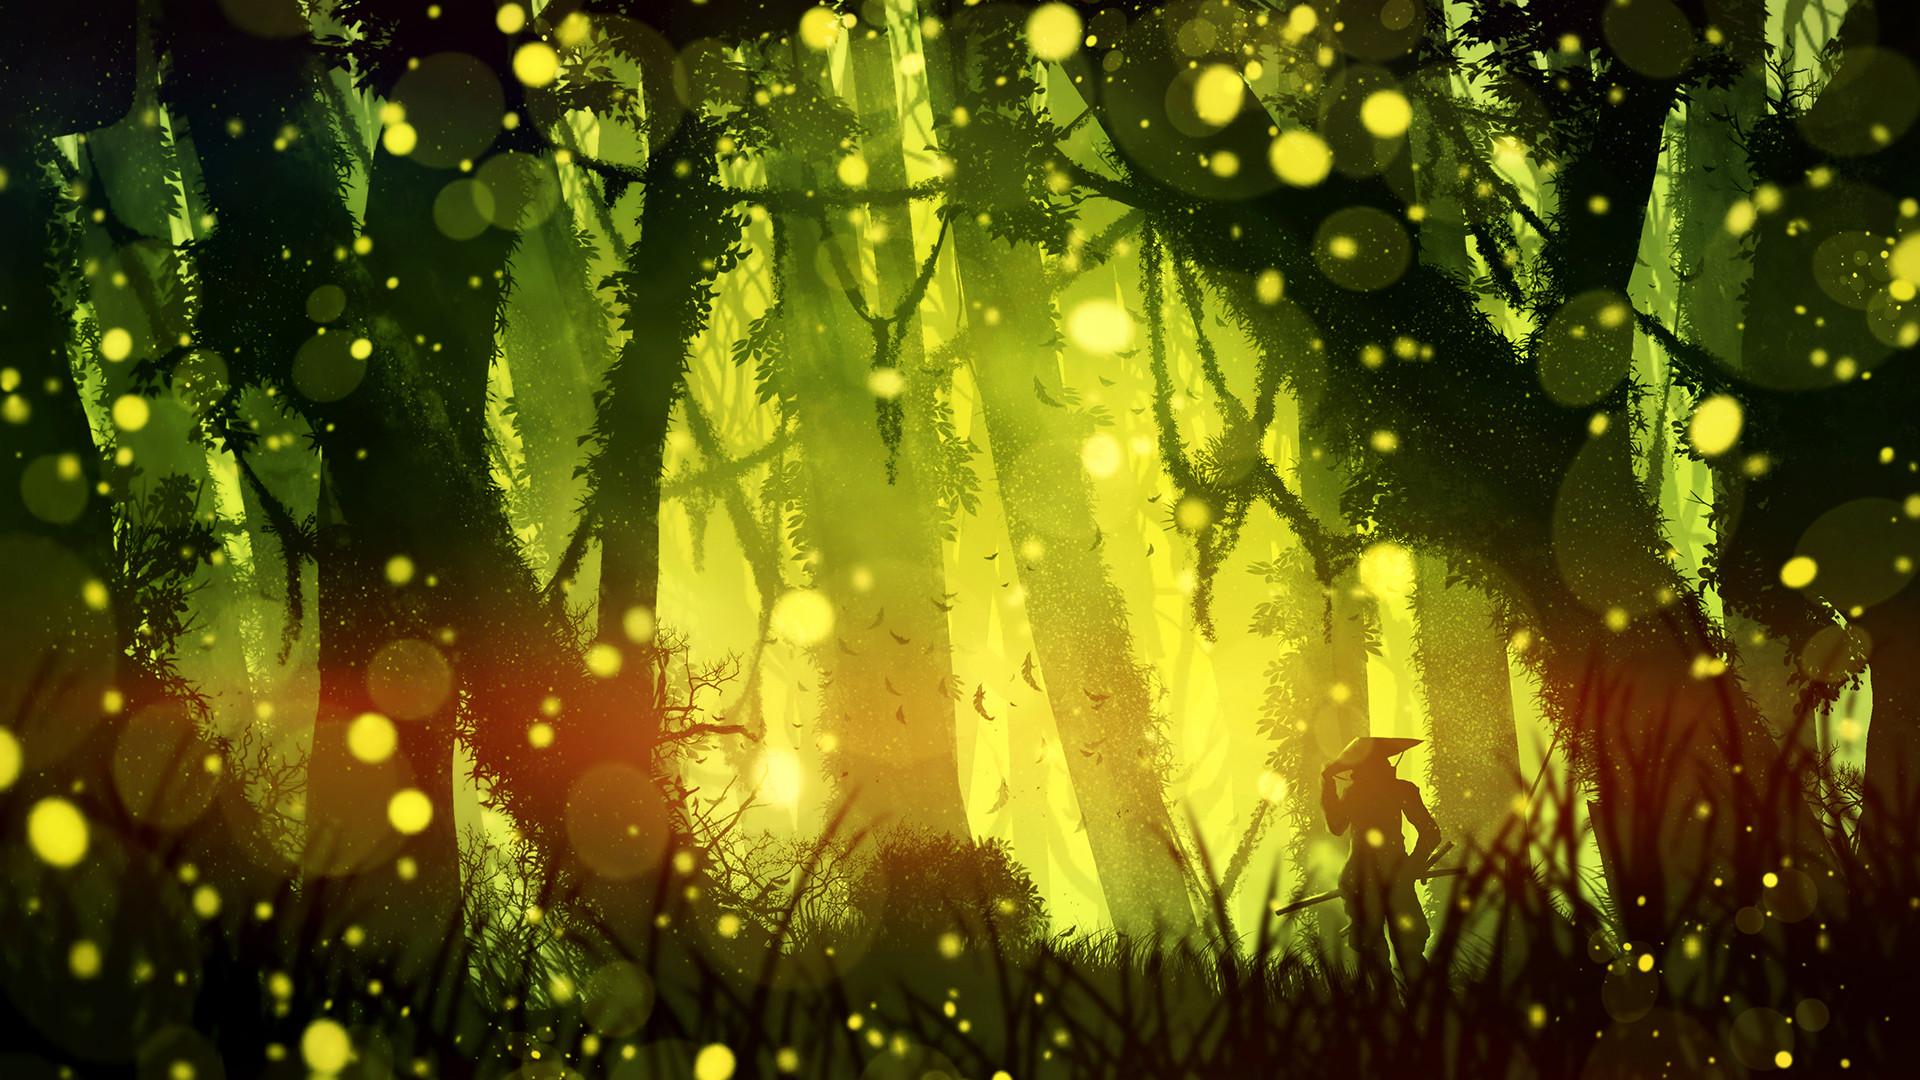 Firefly Forest Samurai Warrior 1920x1080